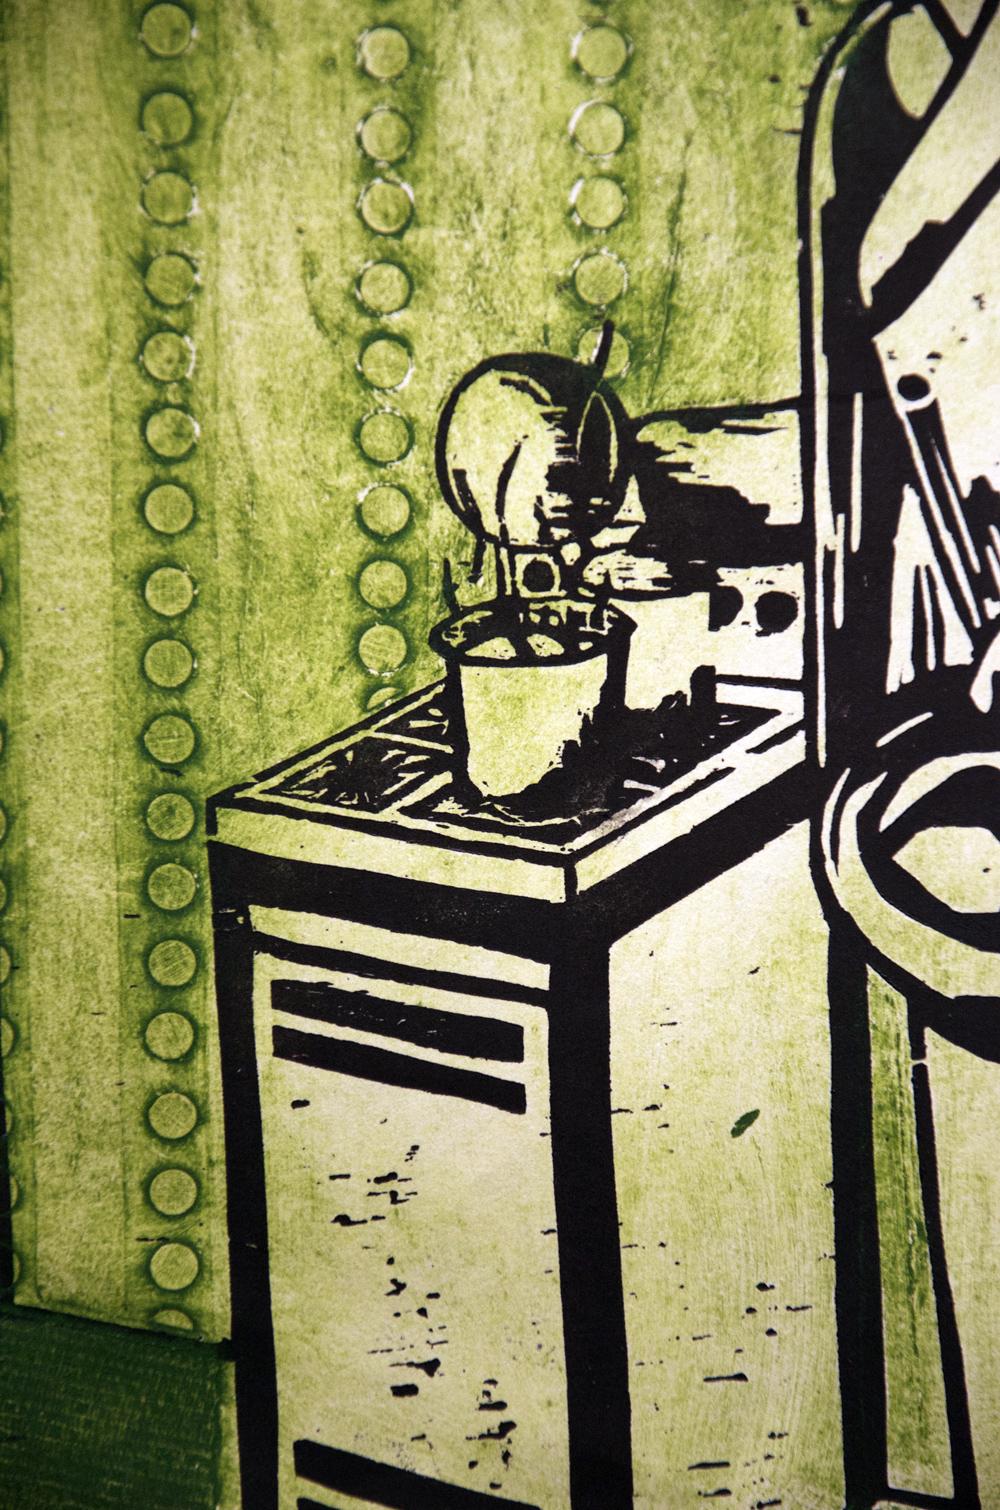 Dinner's Ready woodcut print, by Tara Marolf